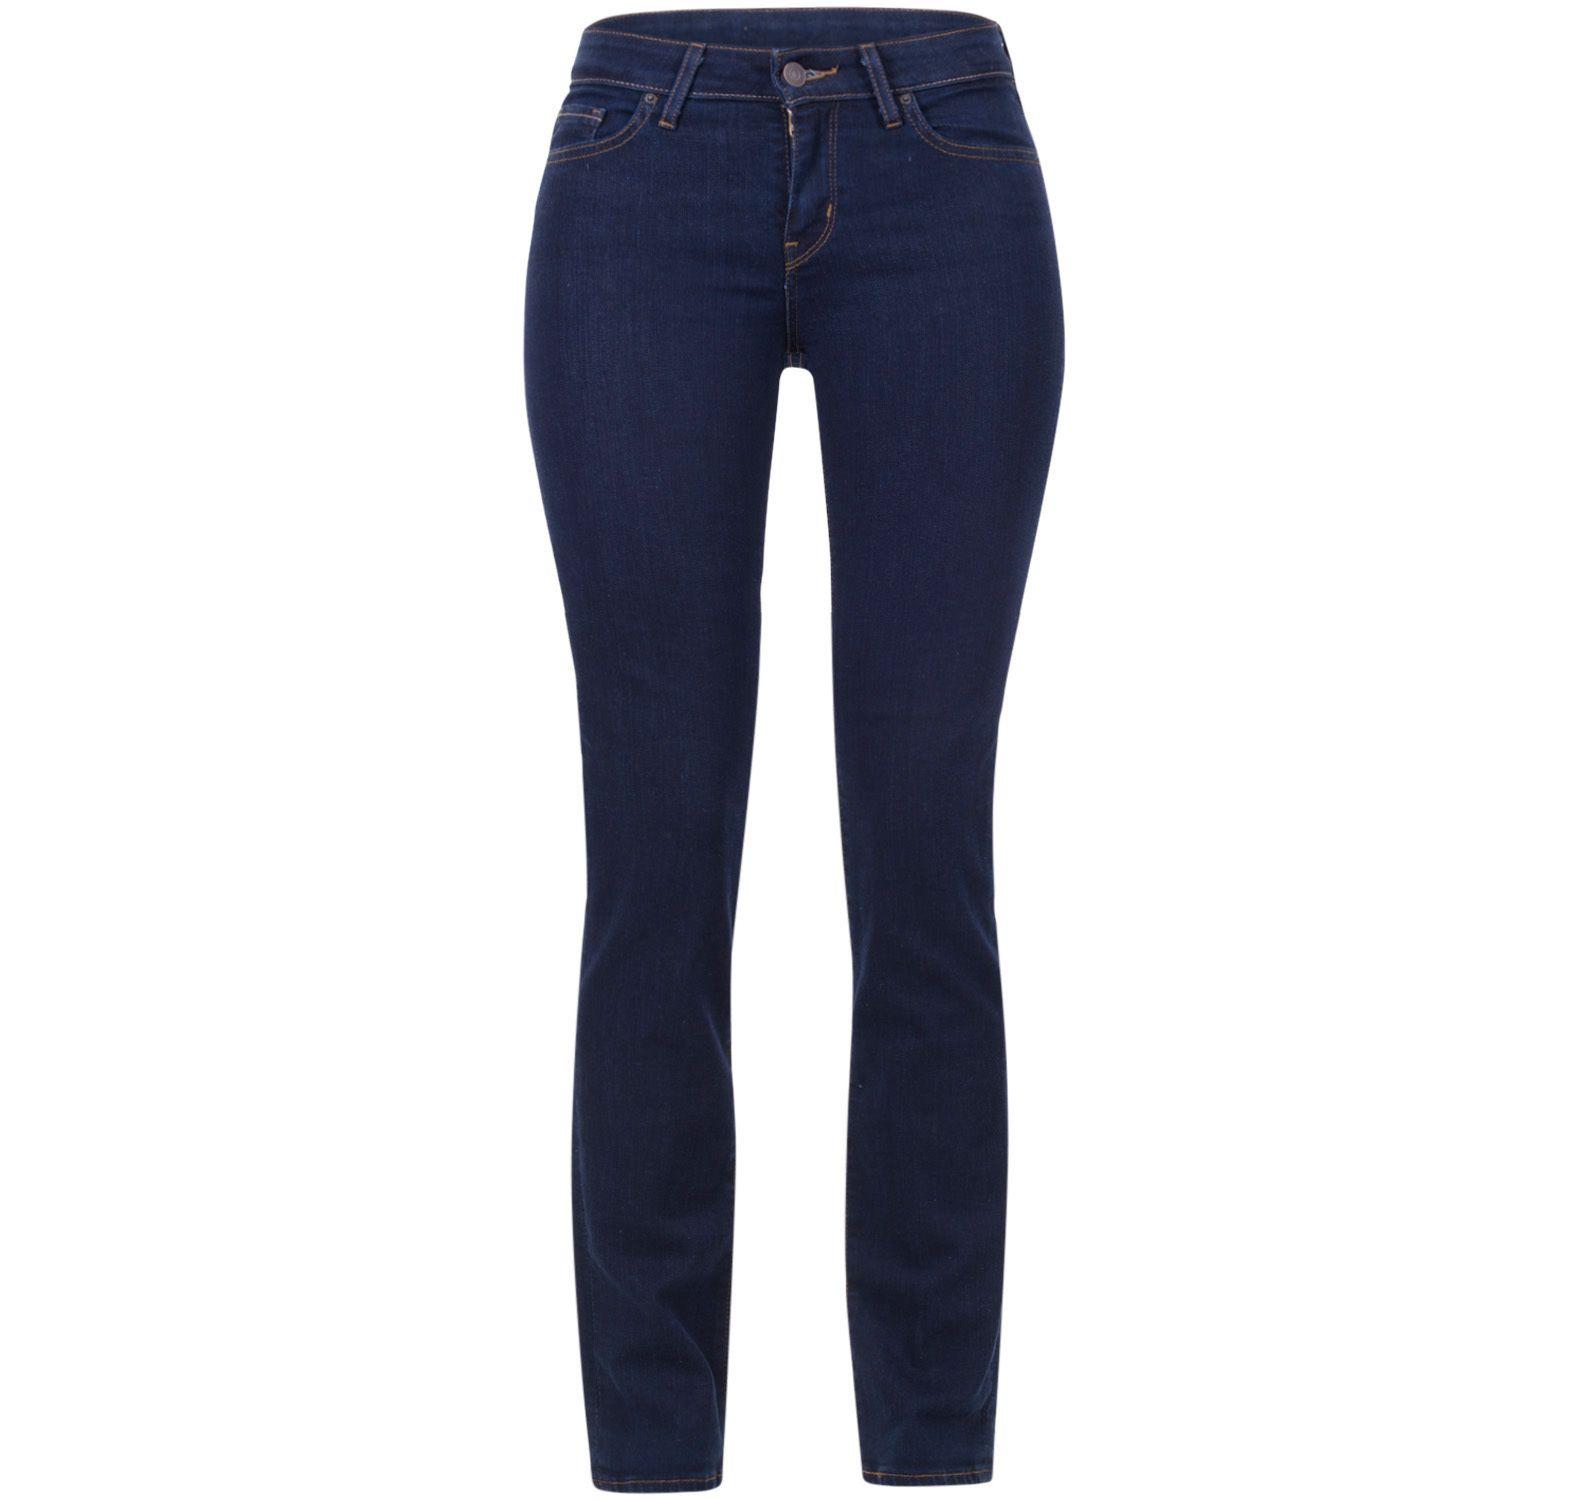 712 slim lone wolf, dark indigo - flat finish, 25/30,  levi's jeans